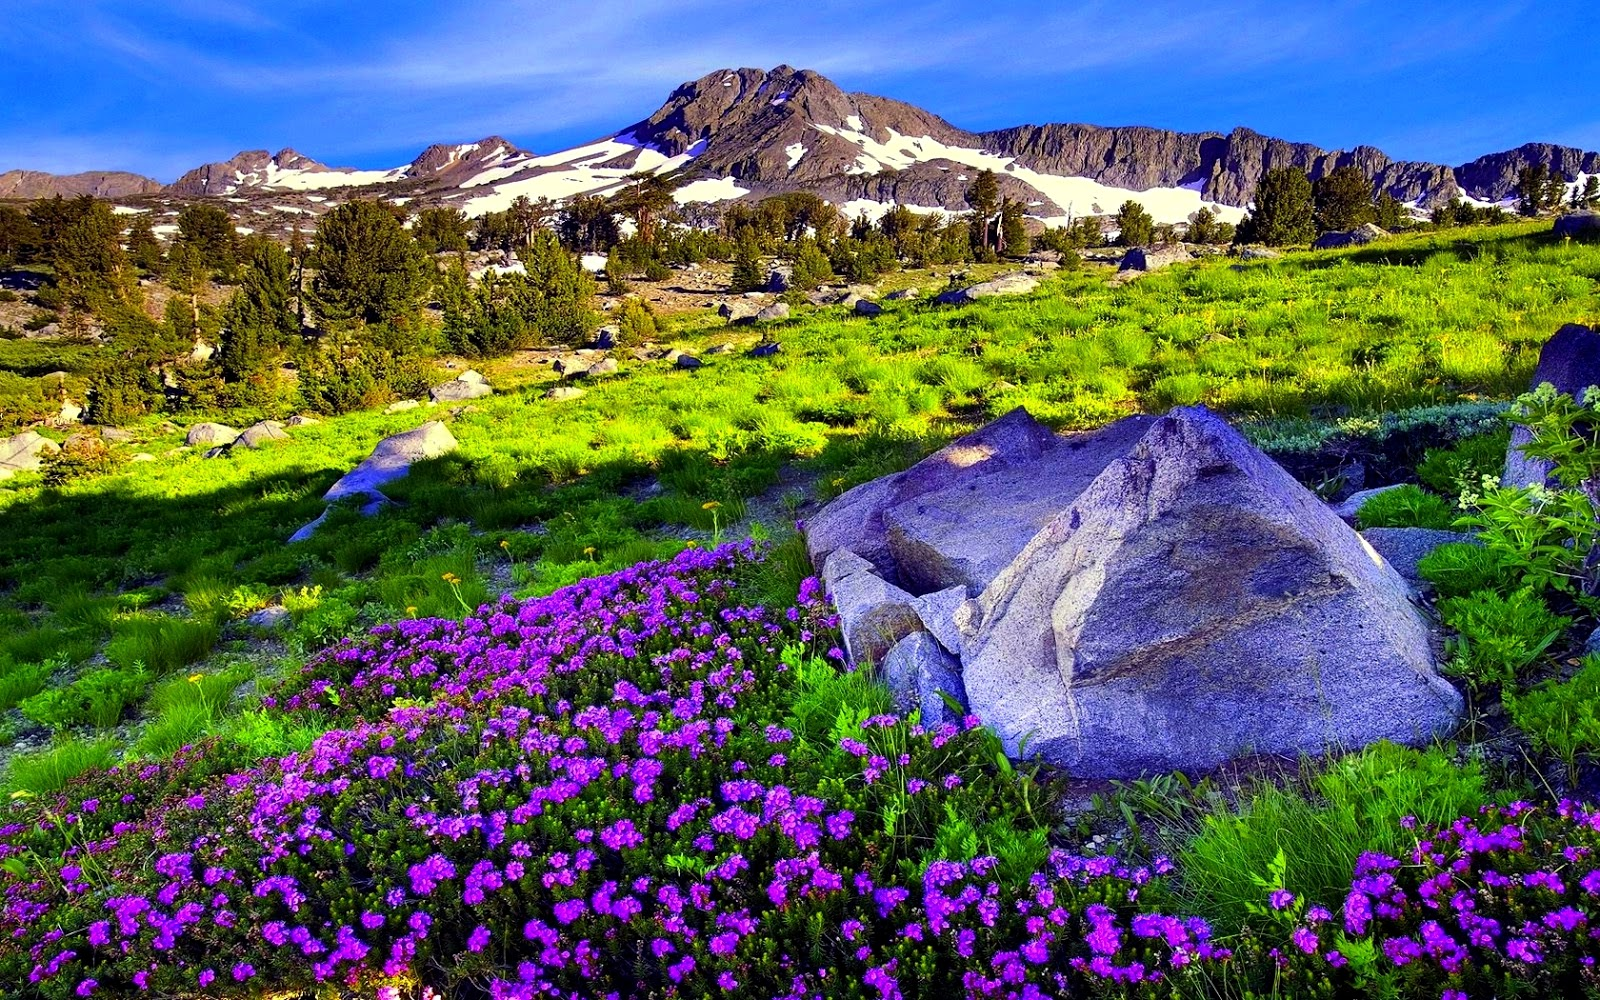 Imagini desktop primavara poze super misto for Immagini desktop primavera